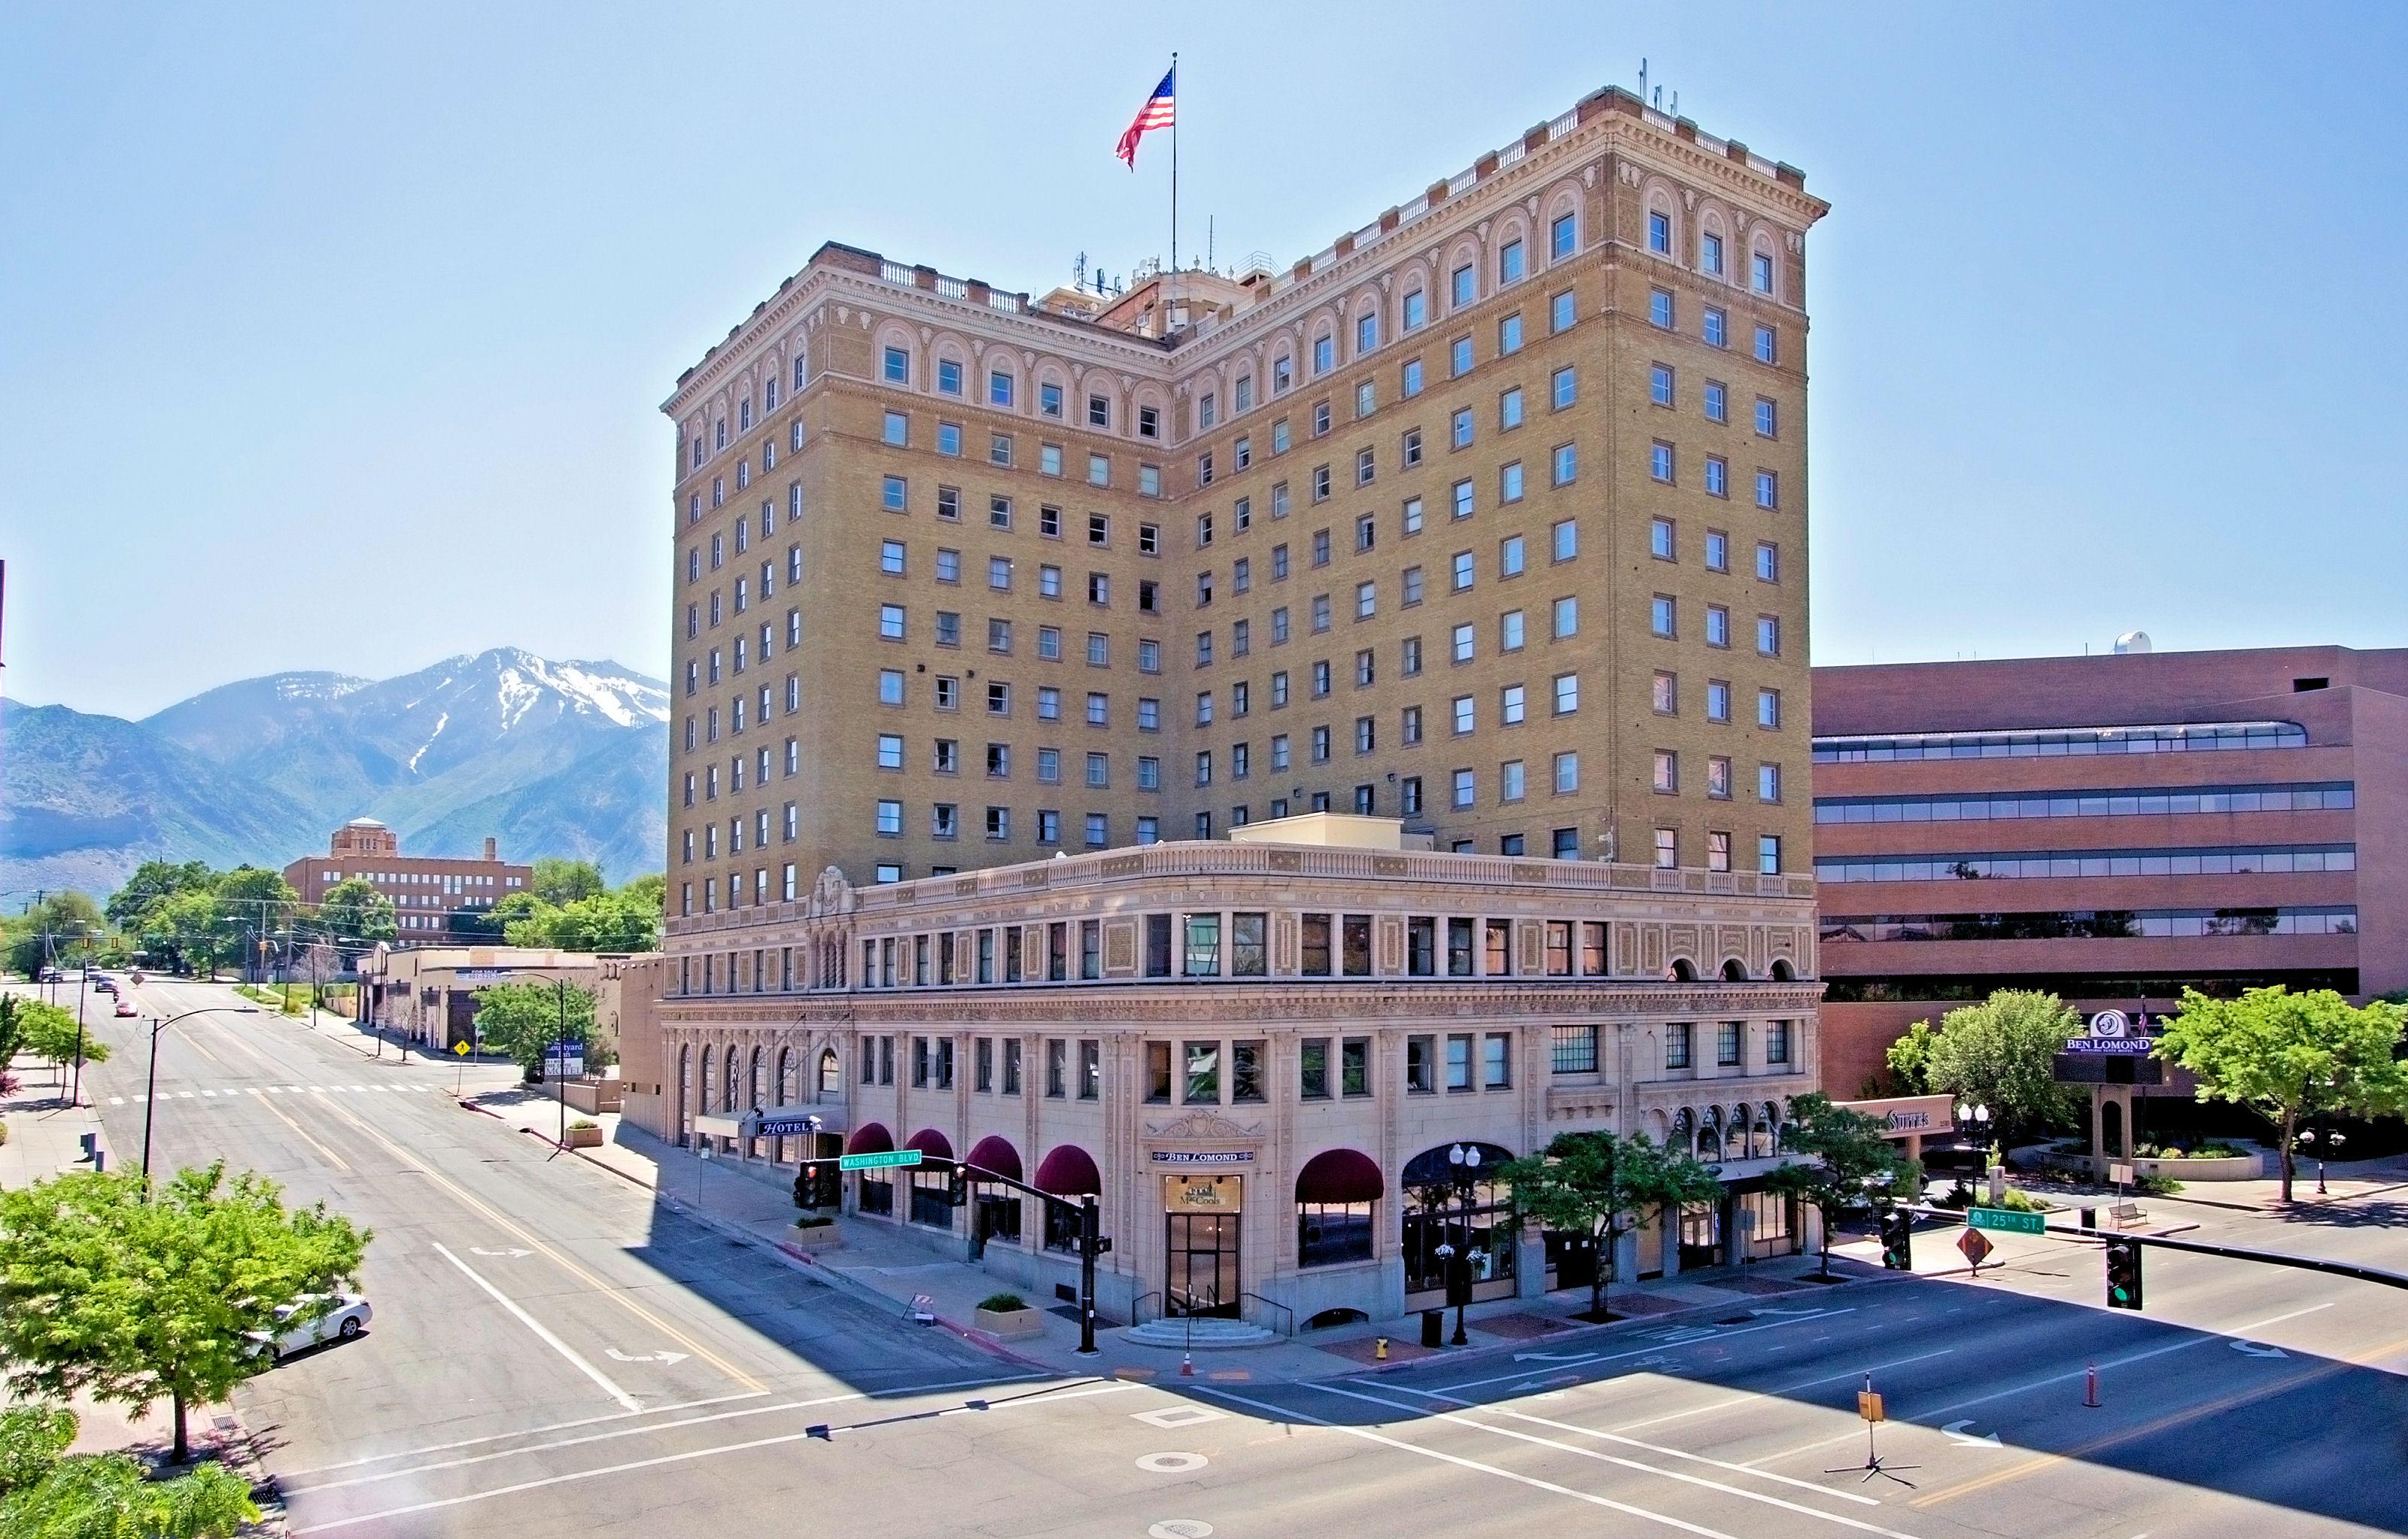 Ben Lomond Suites Historic Hotel,  an Ascend Collection Hotel